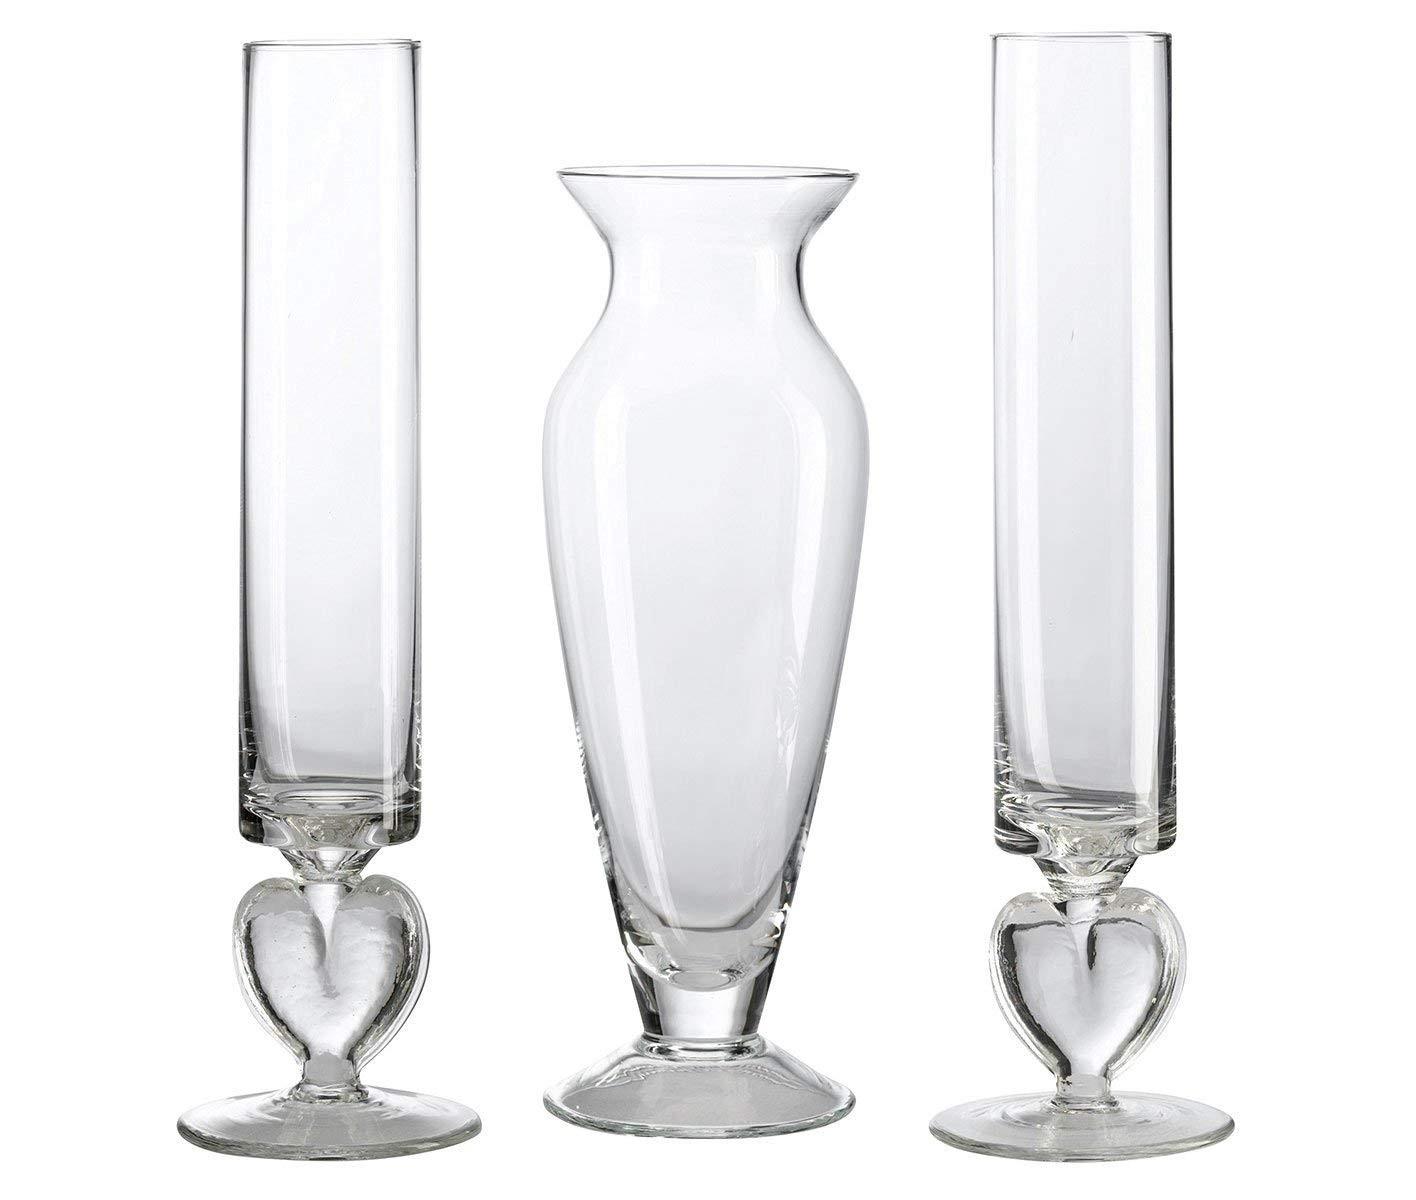 glass cylinder vases 9 in of amazon com lillian rose unity sand ceremony wedding vase set home intended for amazon com lillian rose unity sand ceremony wedding vase set home kitchen